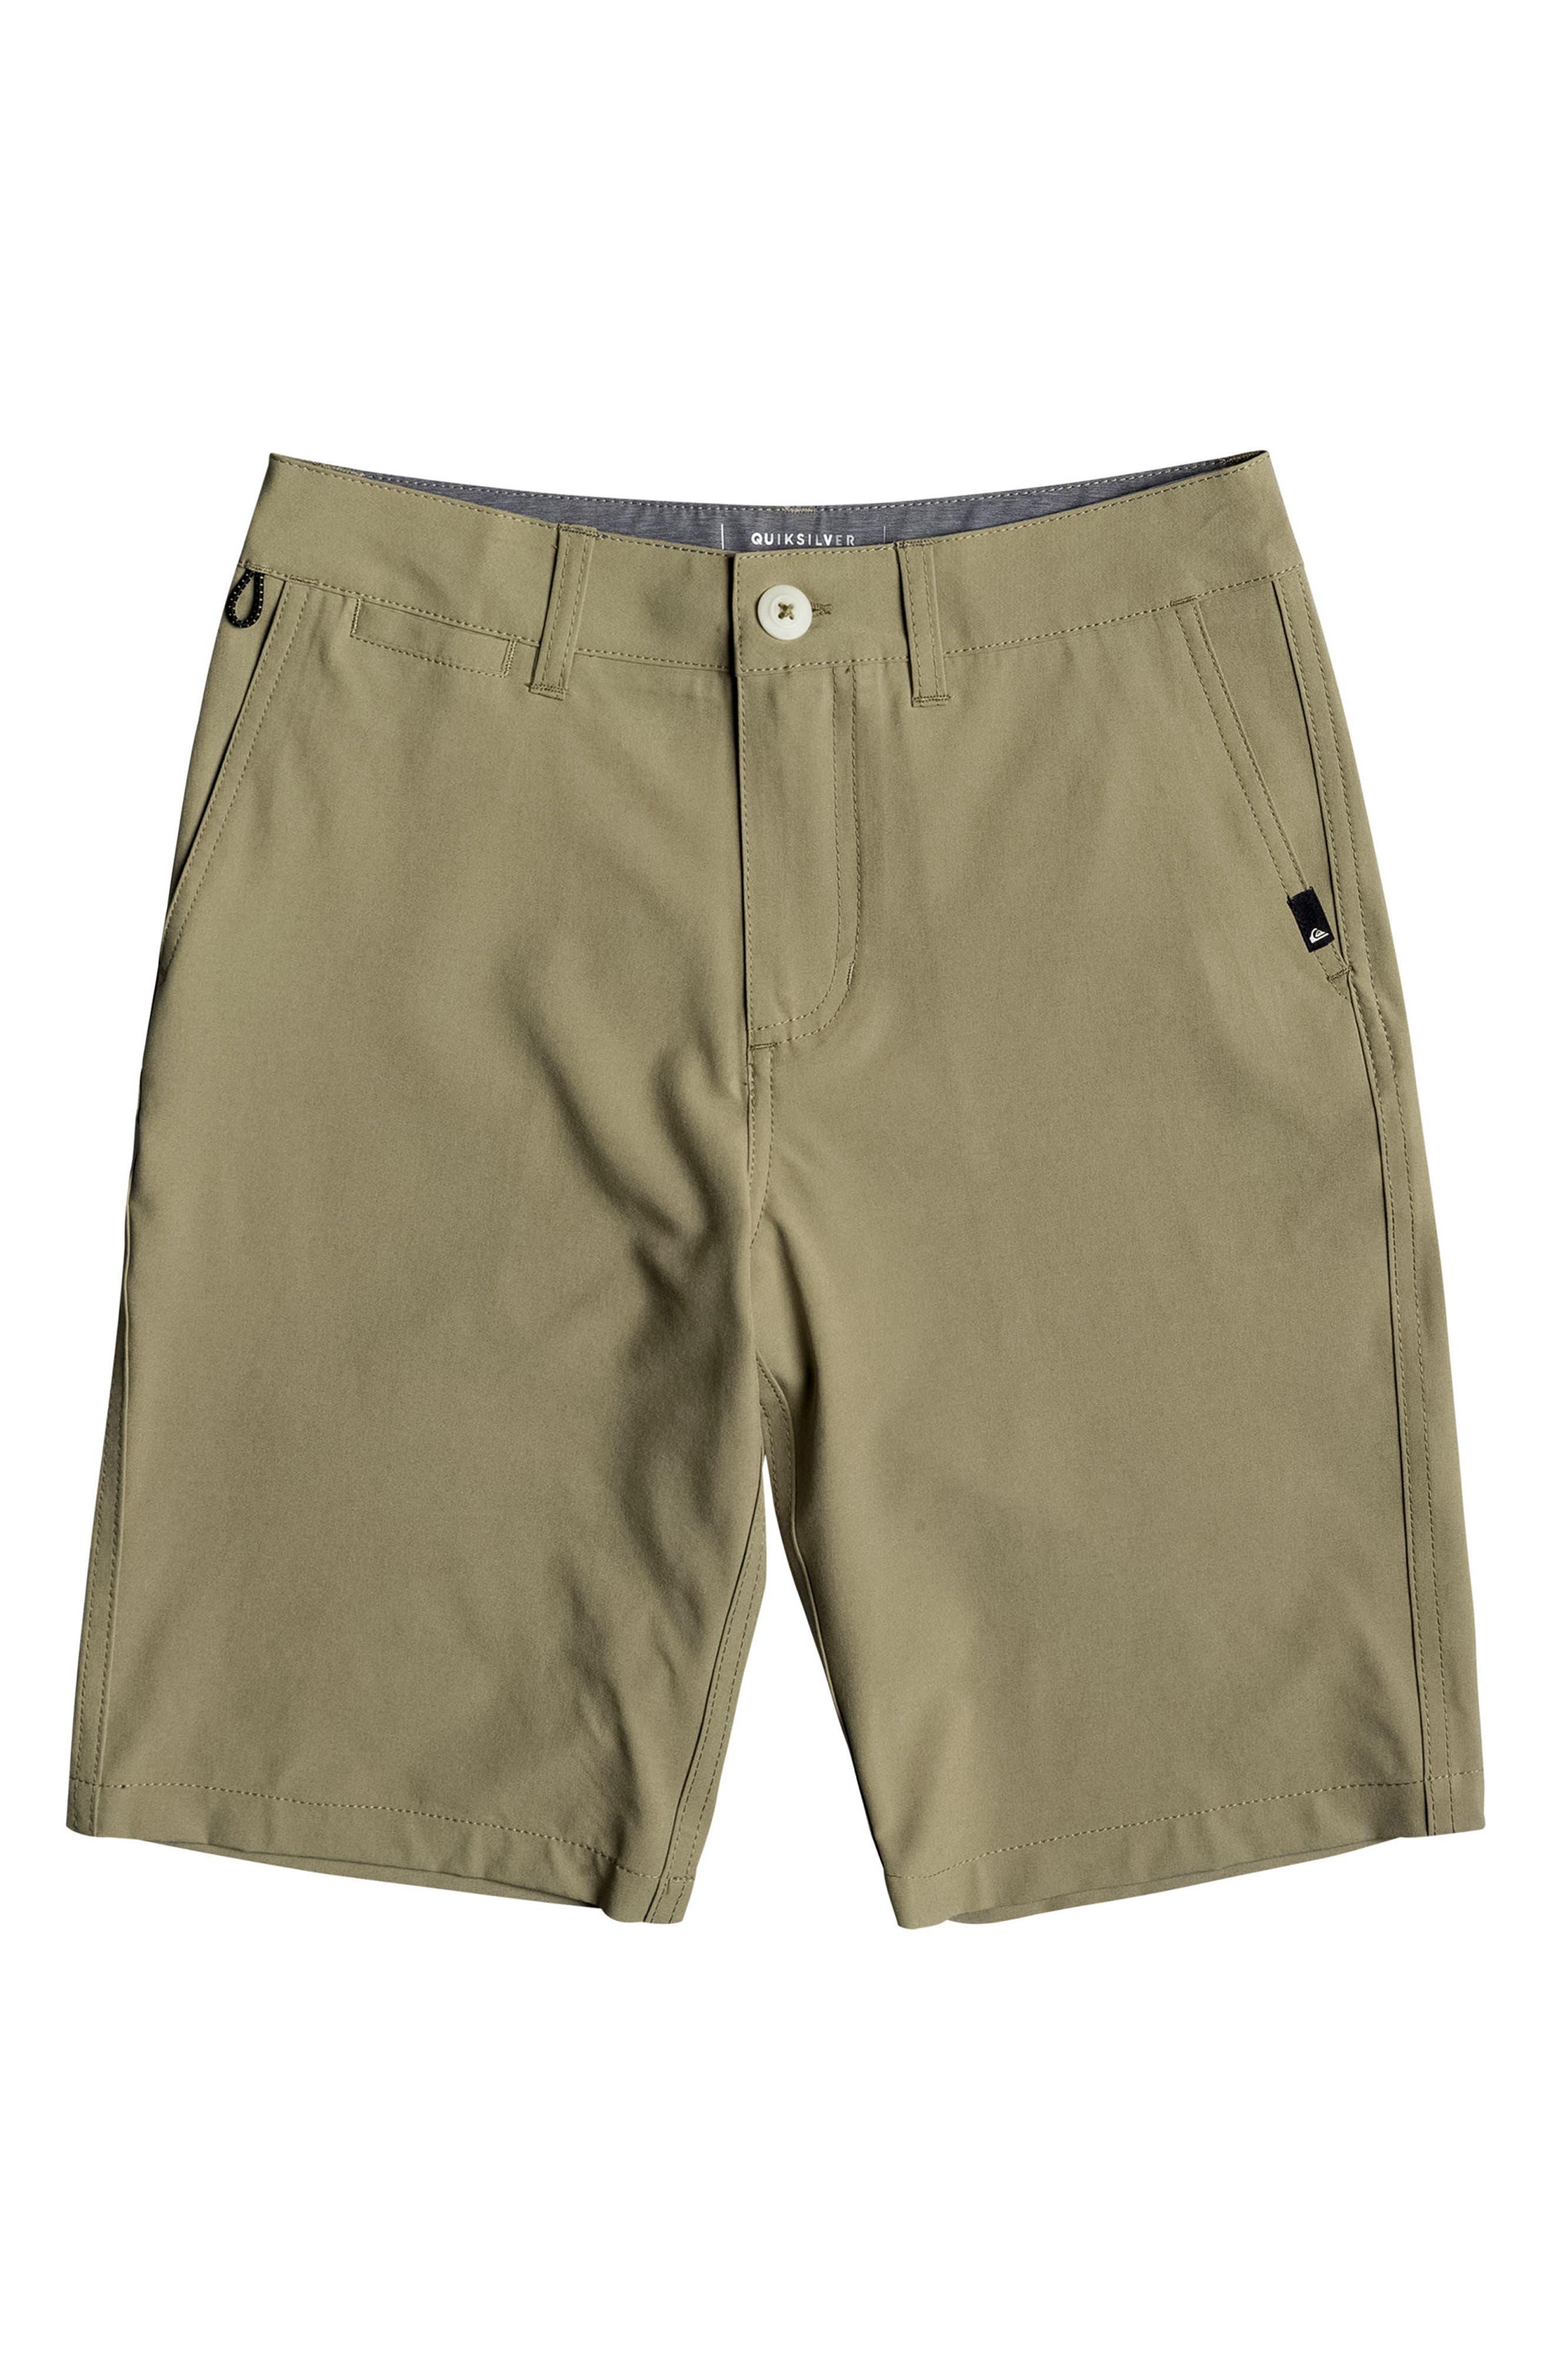 Union Amphibian Board Shorts,                         Main,                         color, Elmwood